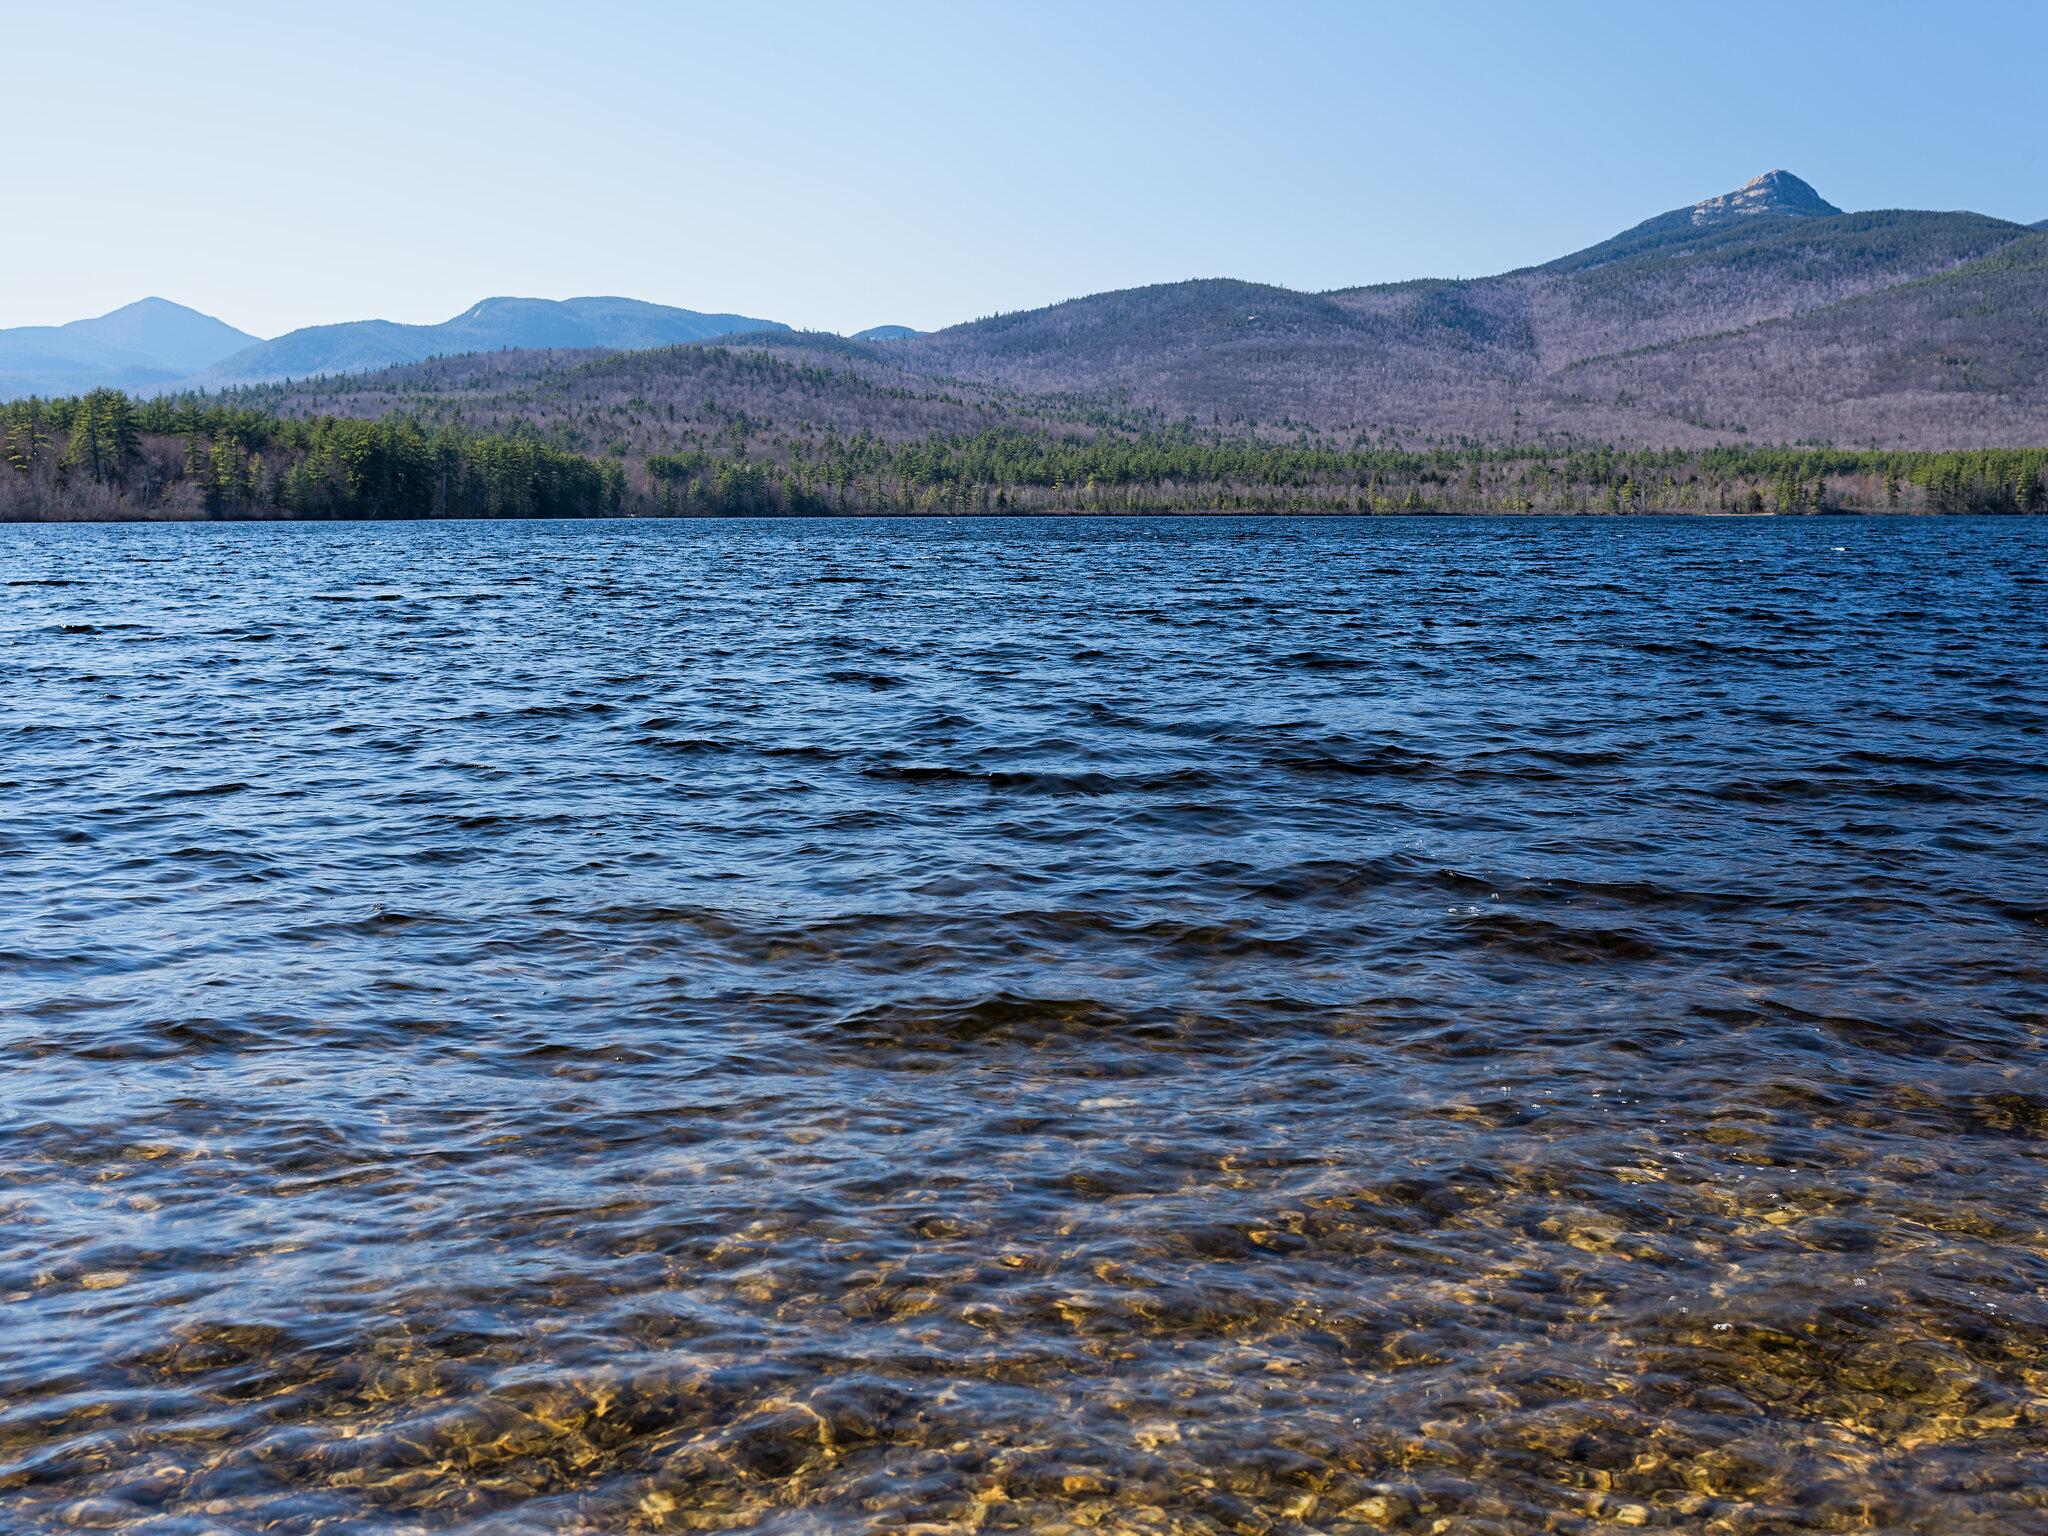 Chocorua lake against White mountains background (NH) [OC] [2048x1536]